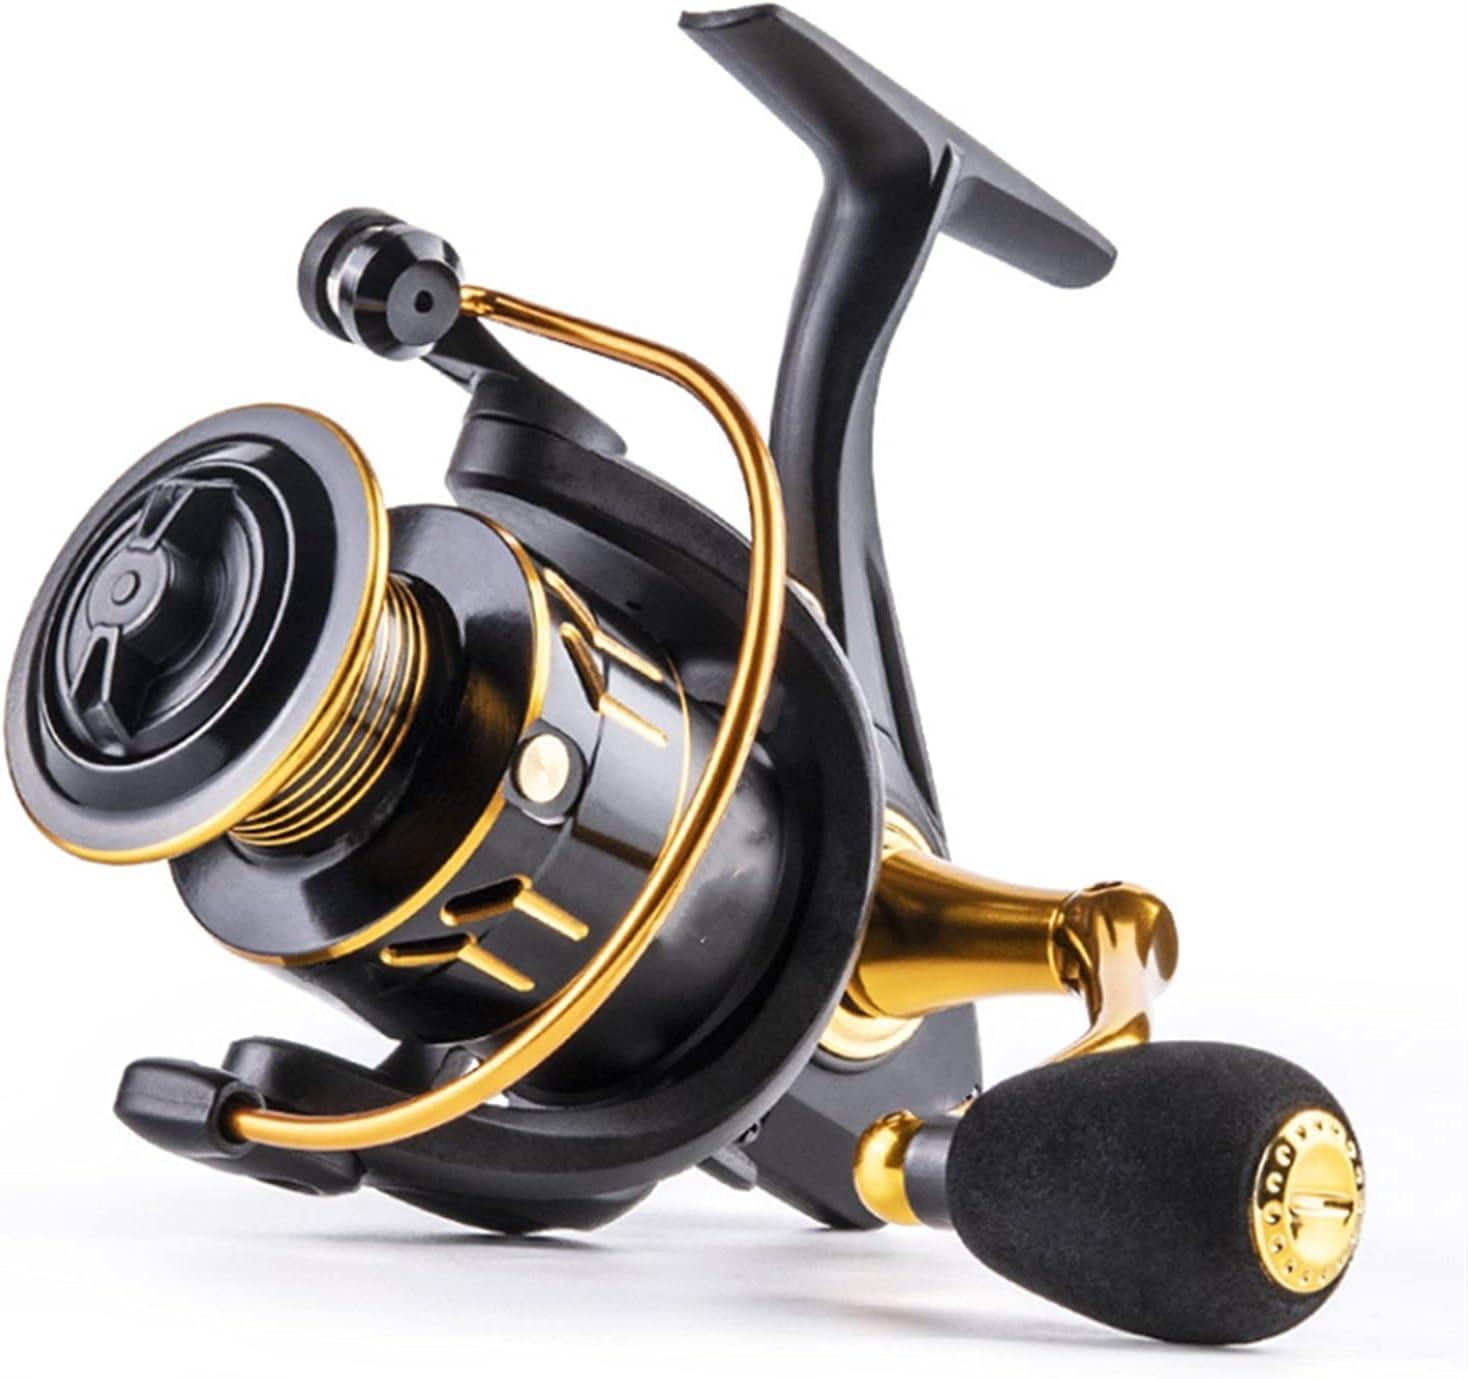 Max 67% OFF ACYC Raleigh Mall Fishing Reels Reel Series Revolving X3-1000-7000 Fi